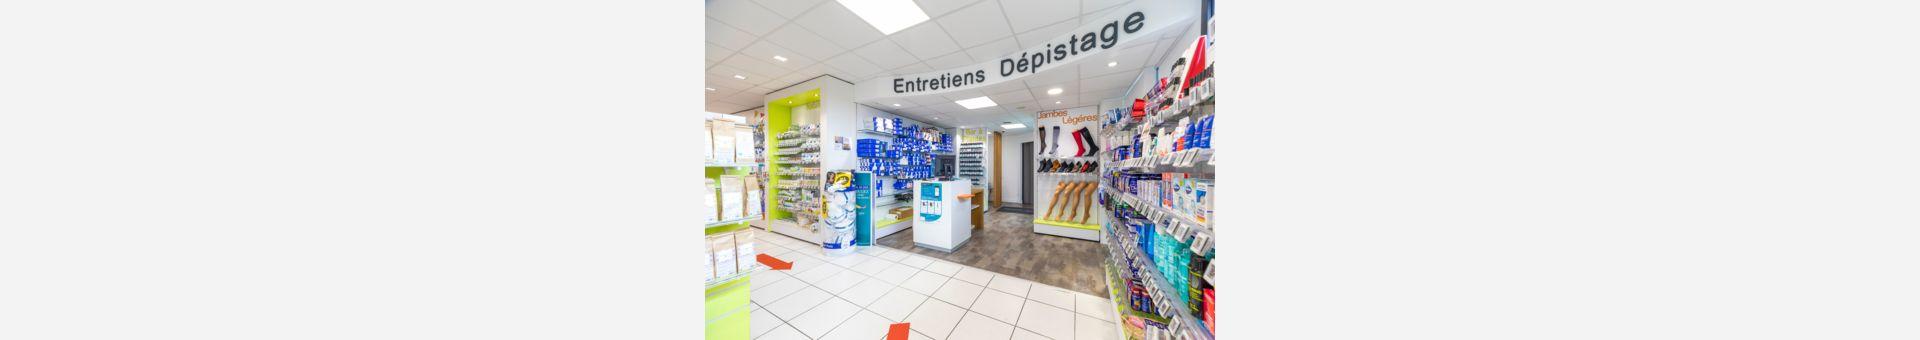 Pharmacie De Gascogne,Seysses